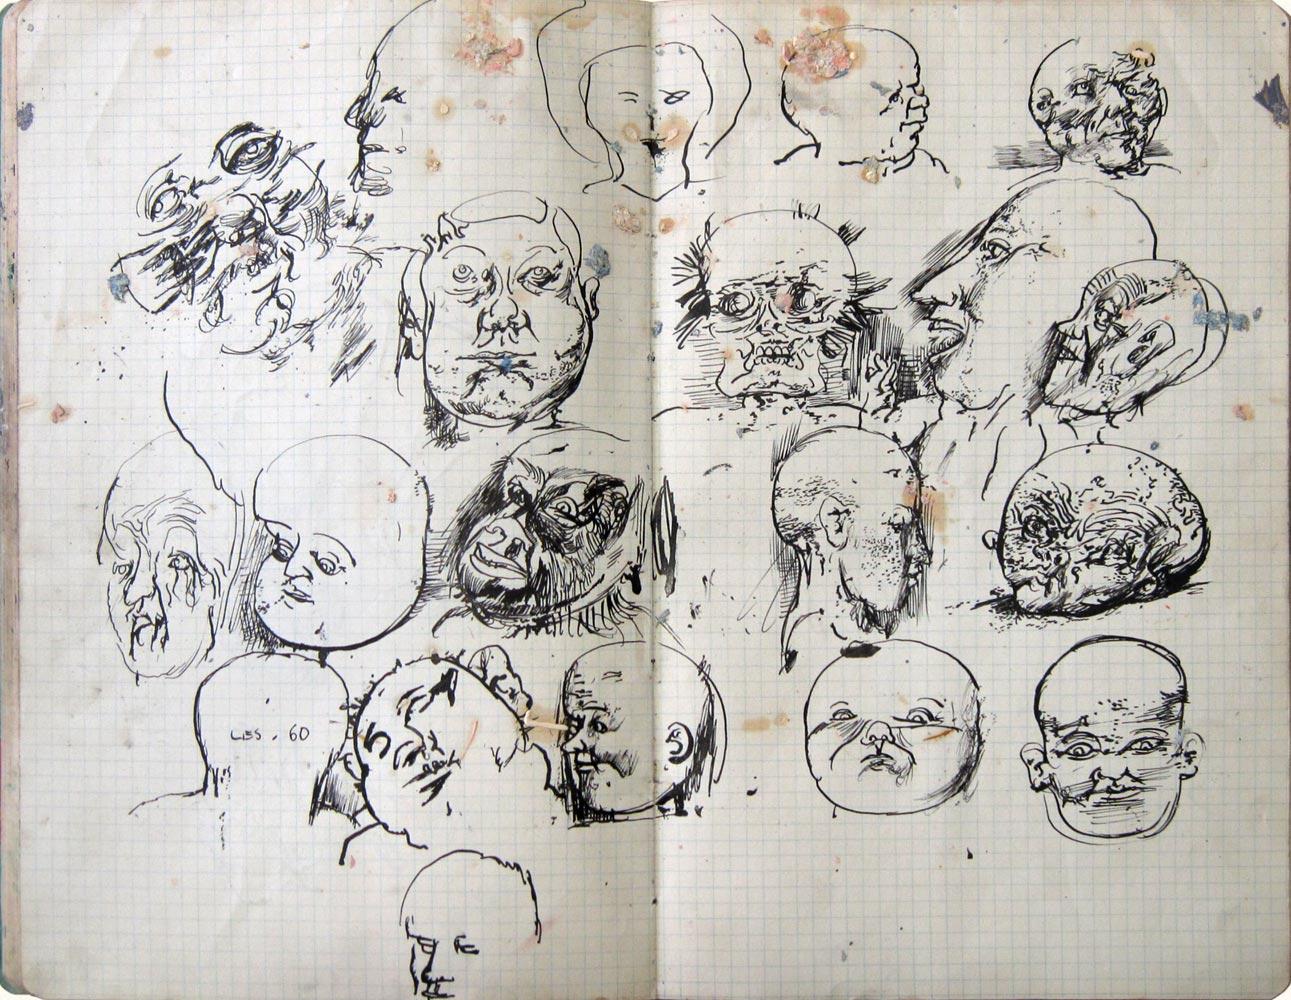 Sketchbook, 1959